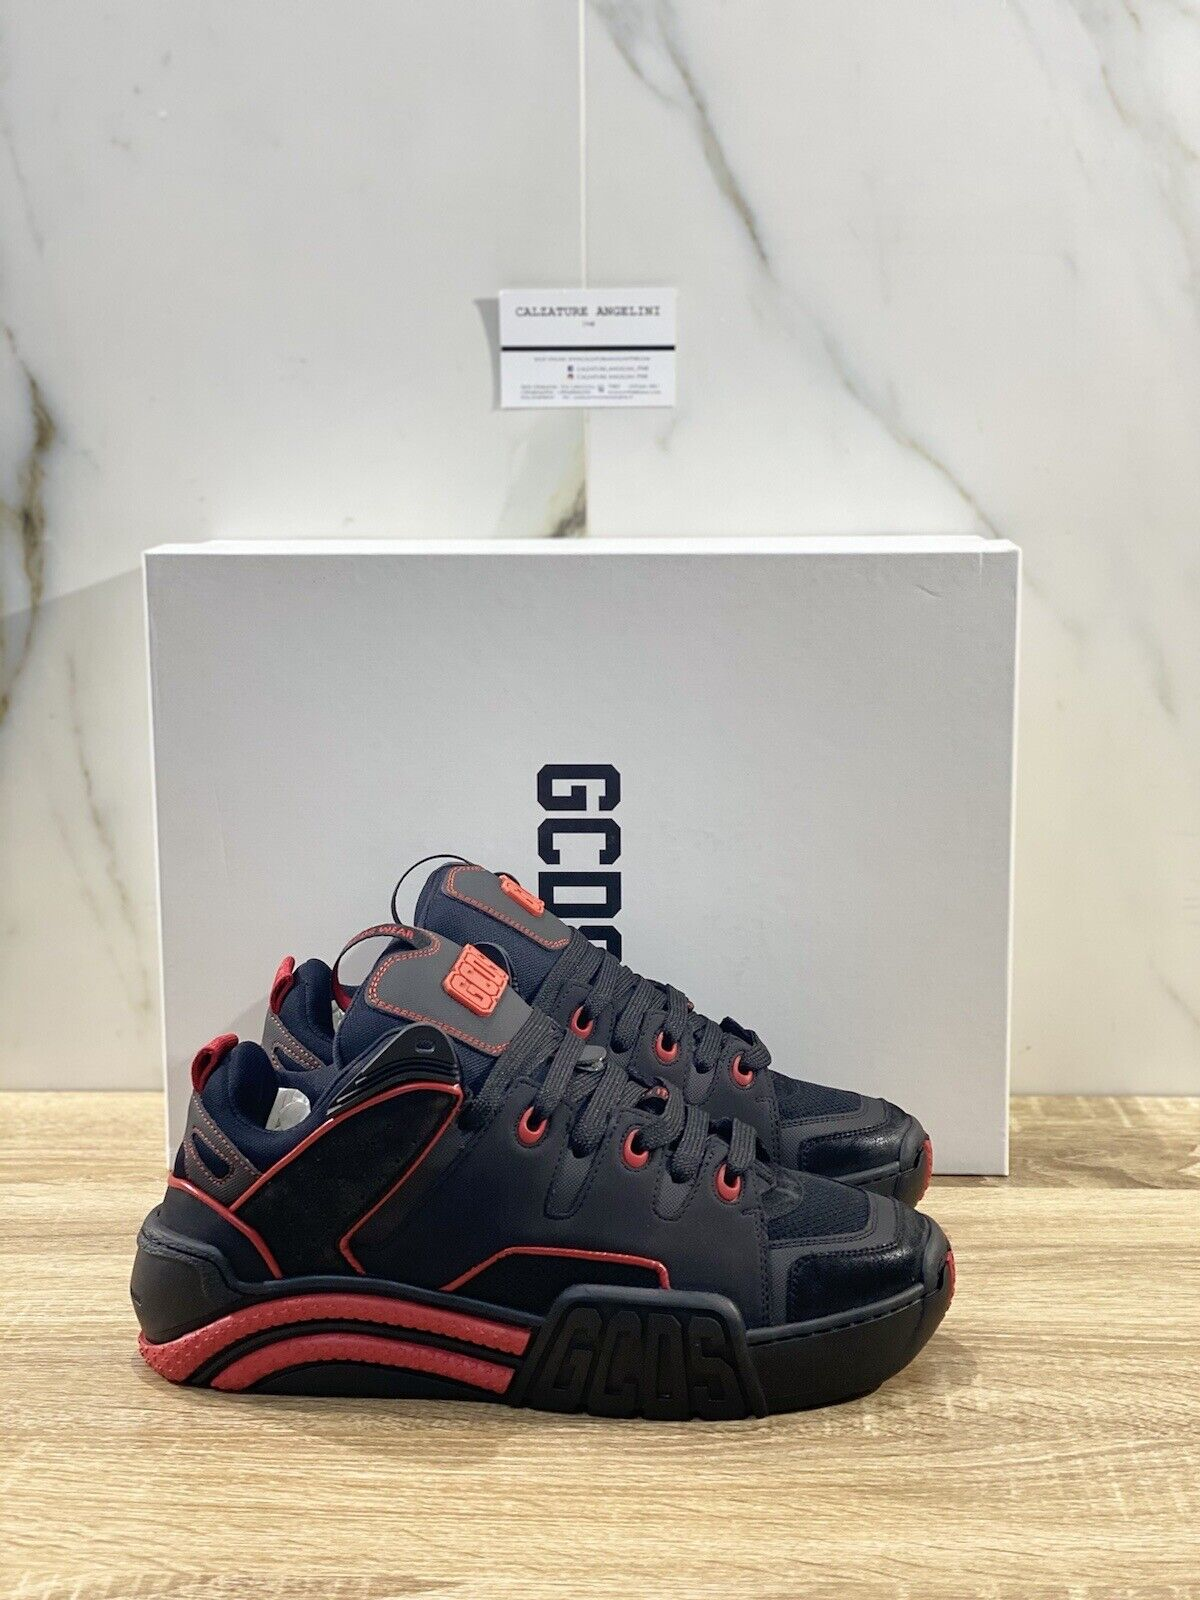 GCDS Skate Men Sneakers Black 10010 Luxury Casual GCDS Shoes 41